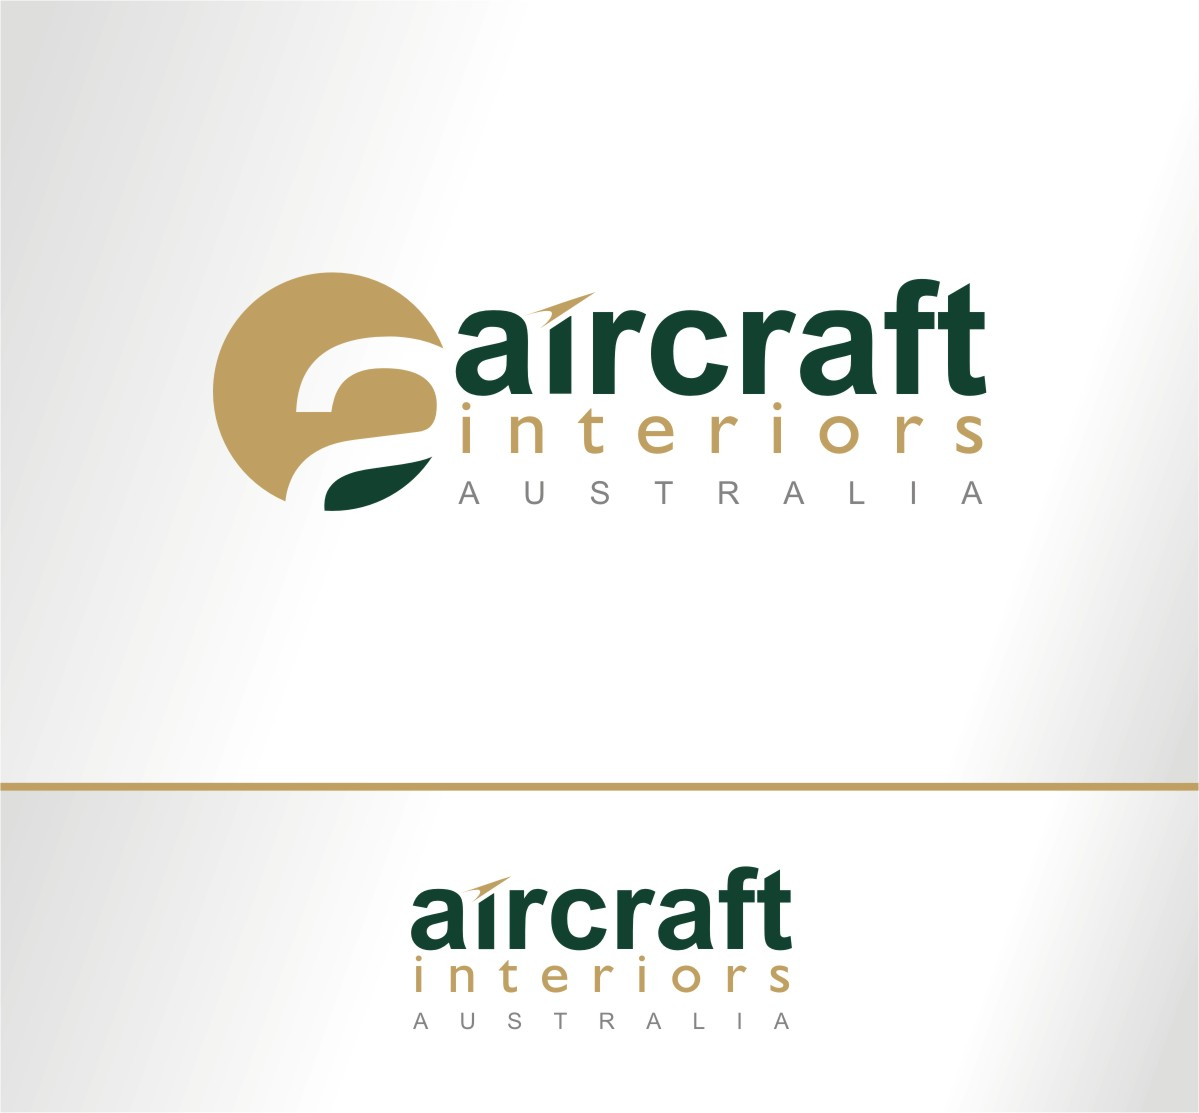 professional serious it company logo design for aircraft interiors australia or aia. Black Bedroom Furniture Sets. Home Design Ideas